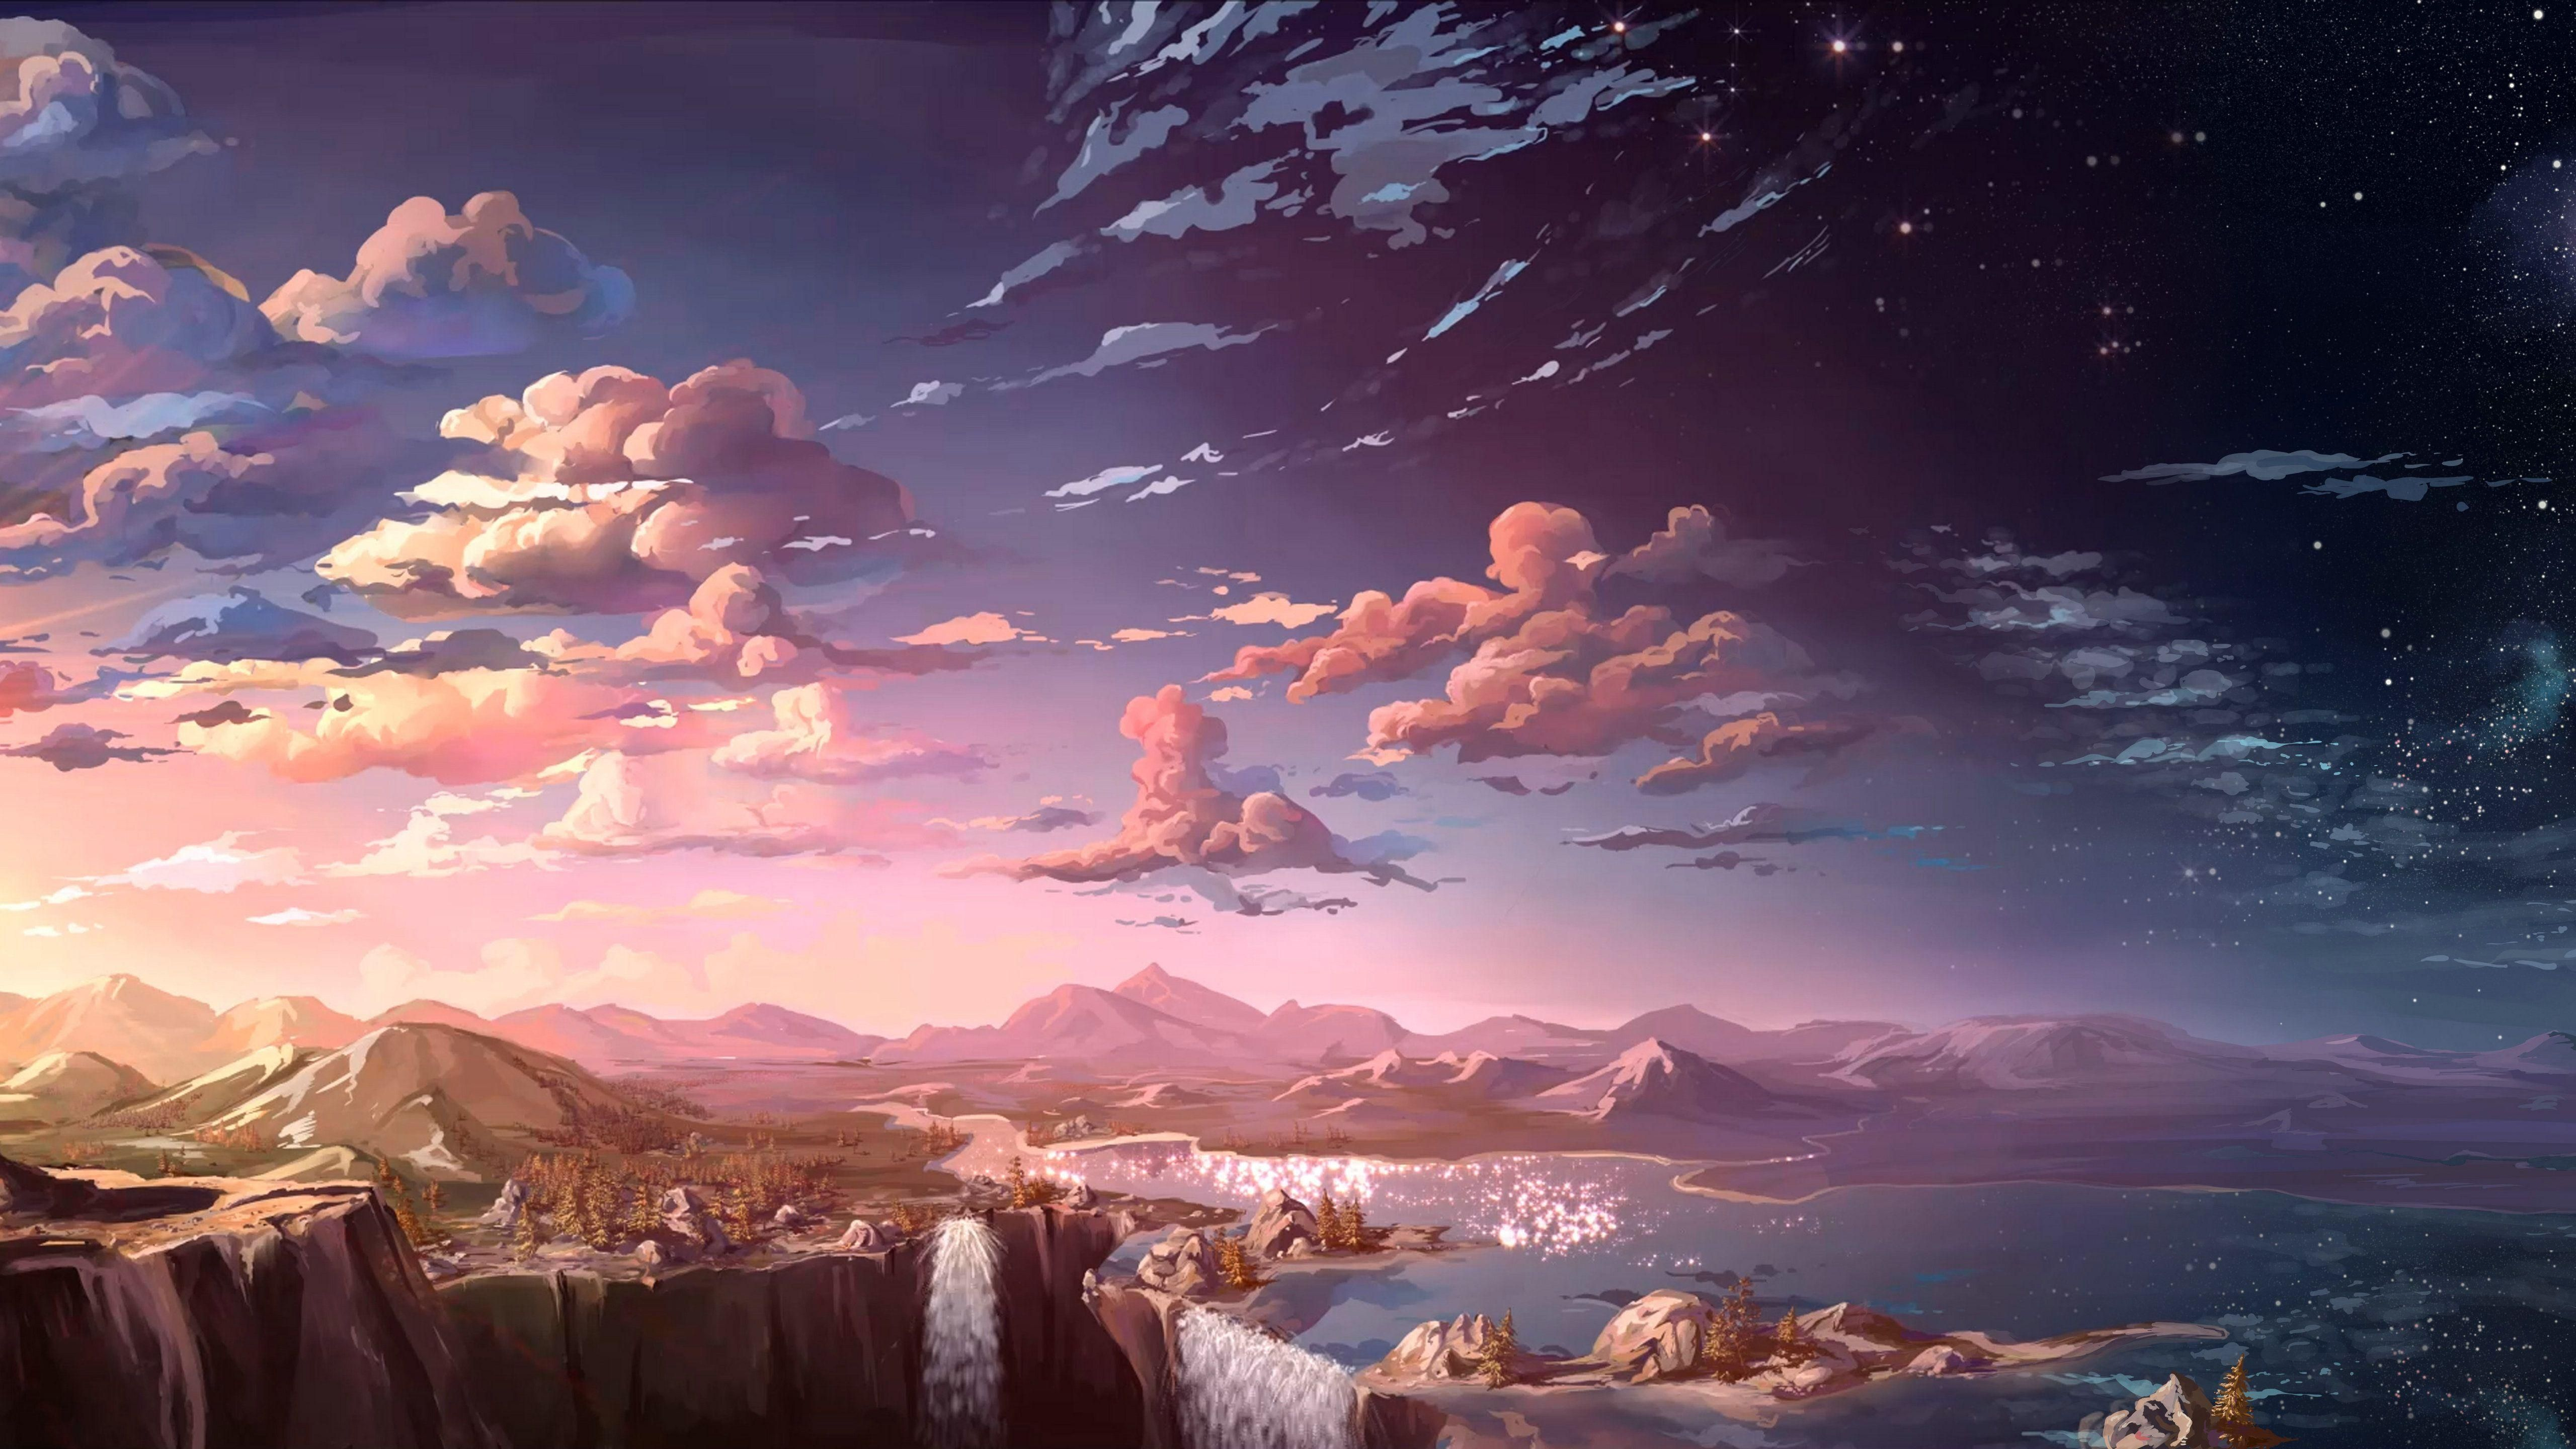 Anime Scenery Art Anime Scenery Scenery Wallpaper Landscape Wallpaper Anime wallpaper hd landscape